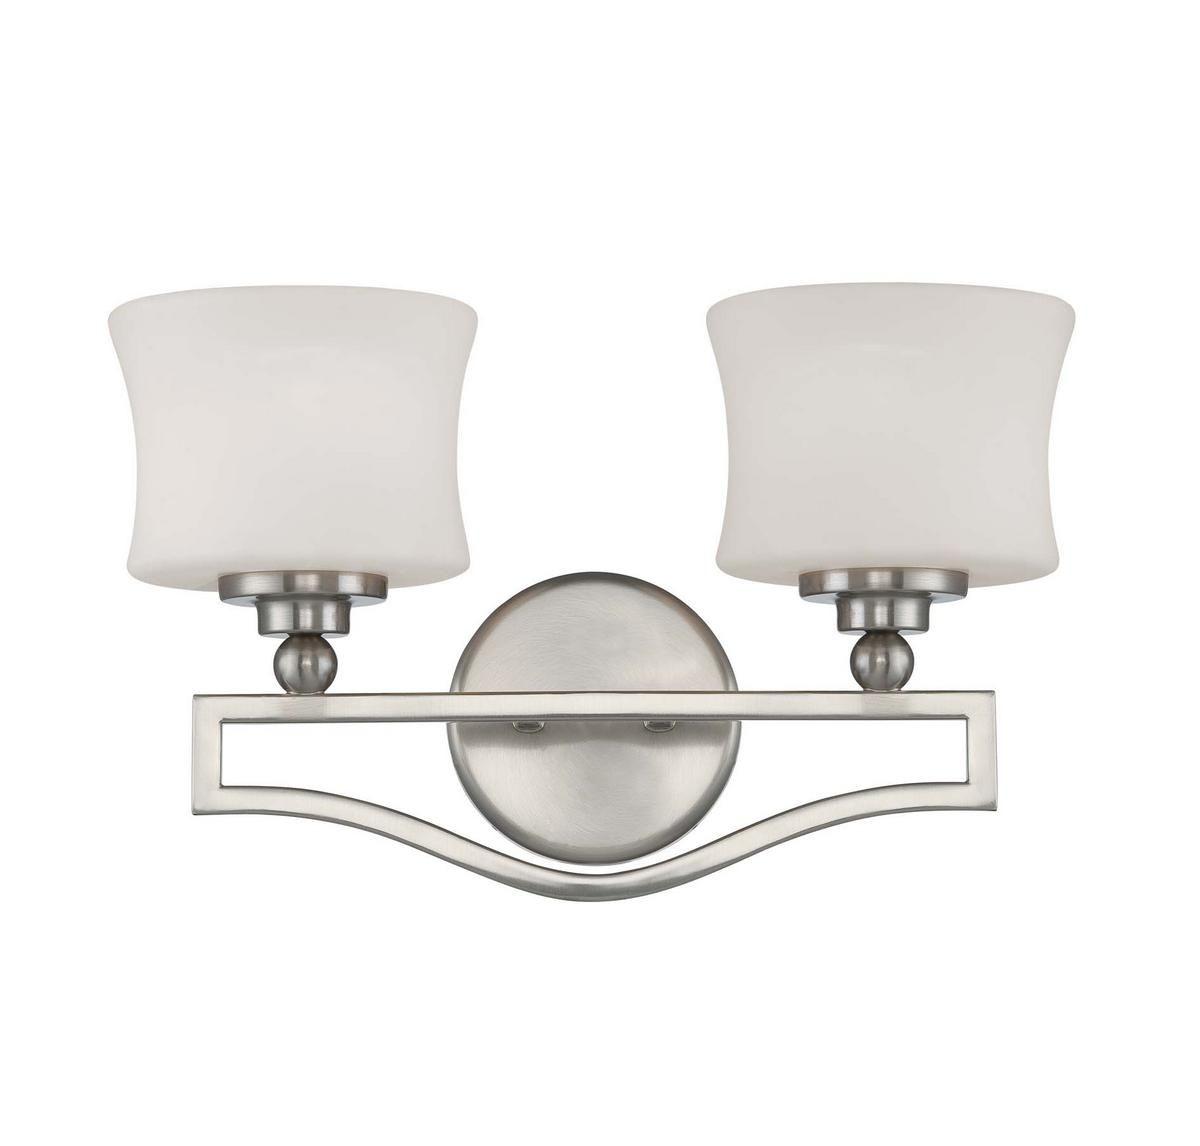 huge selection of 84a8c ed491 Savoy House Terrell 2-Light Bathroom Vanity Light in Satin Nickel